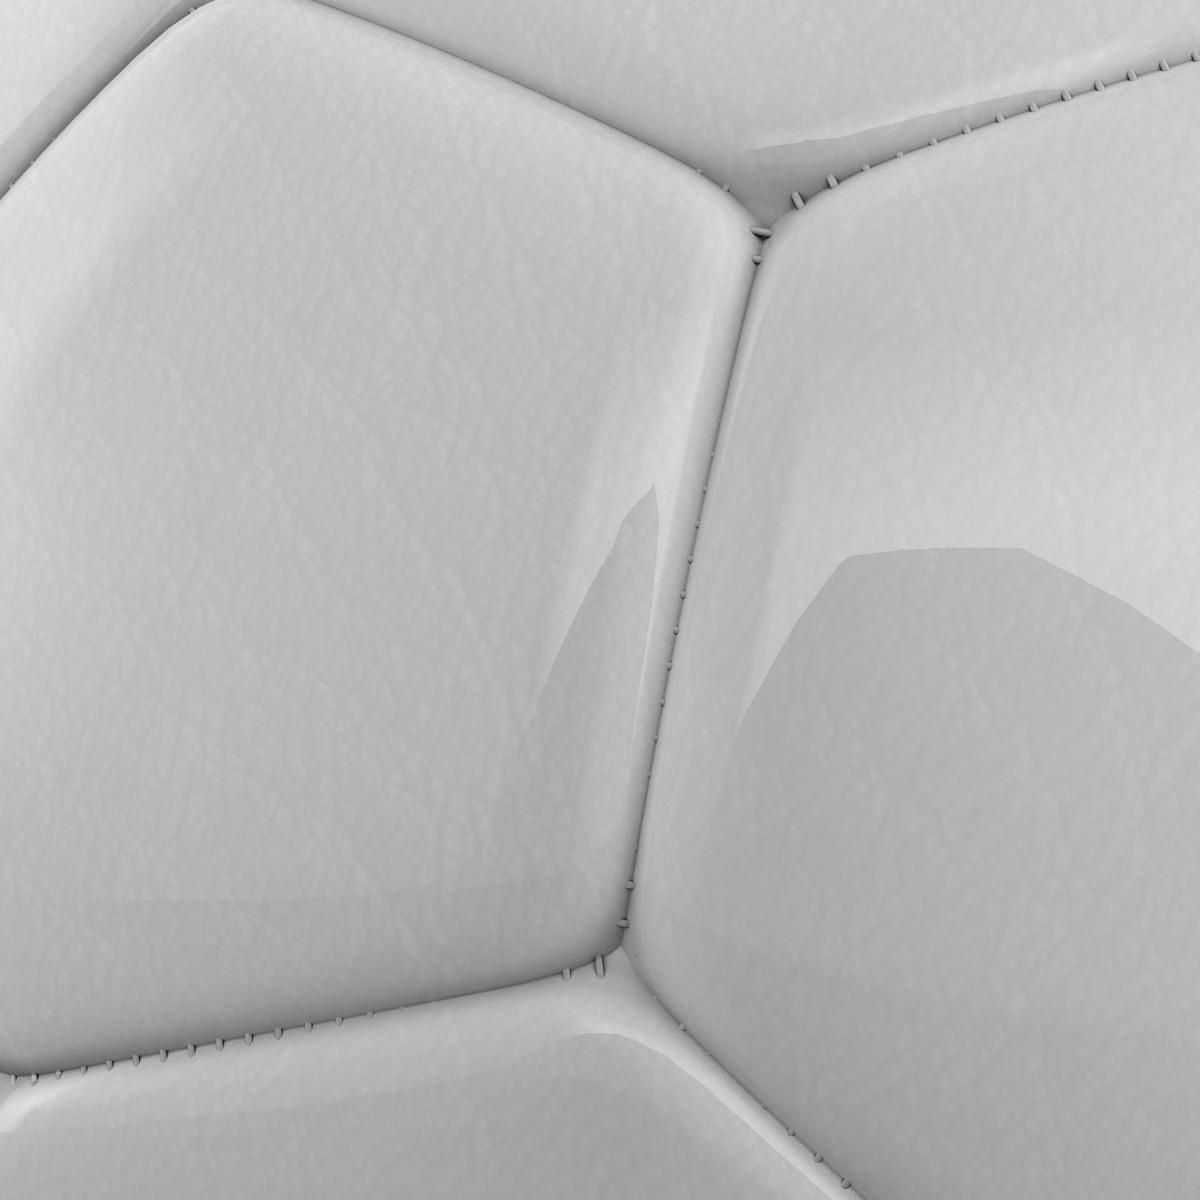 soccerball цагаан 3d загвар 3ds max fbx c4d ma mb obj 205182